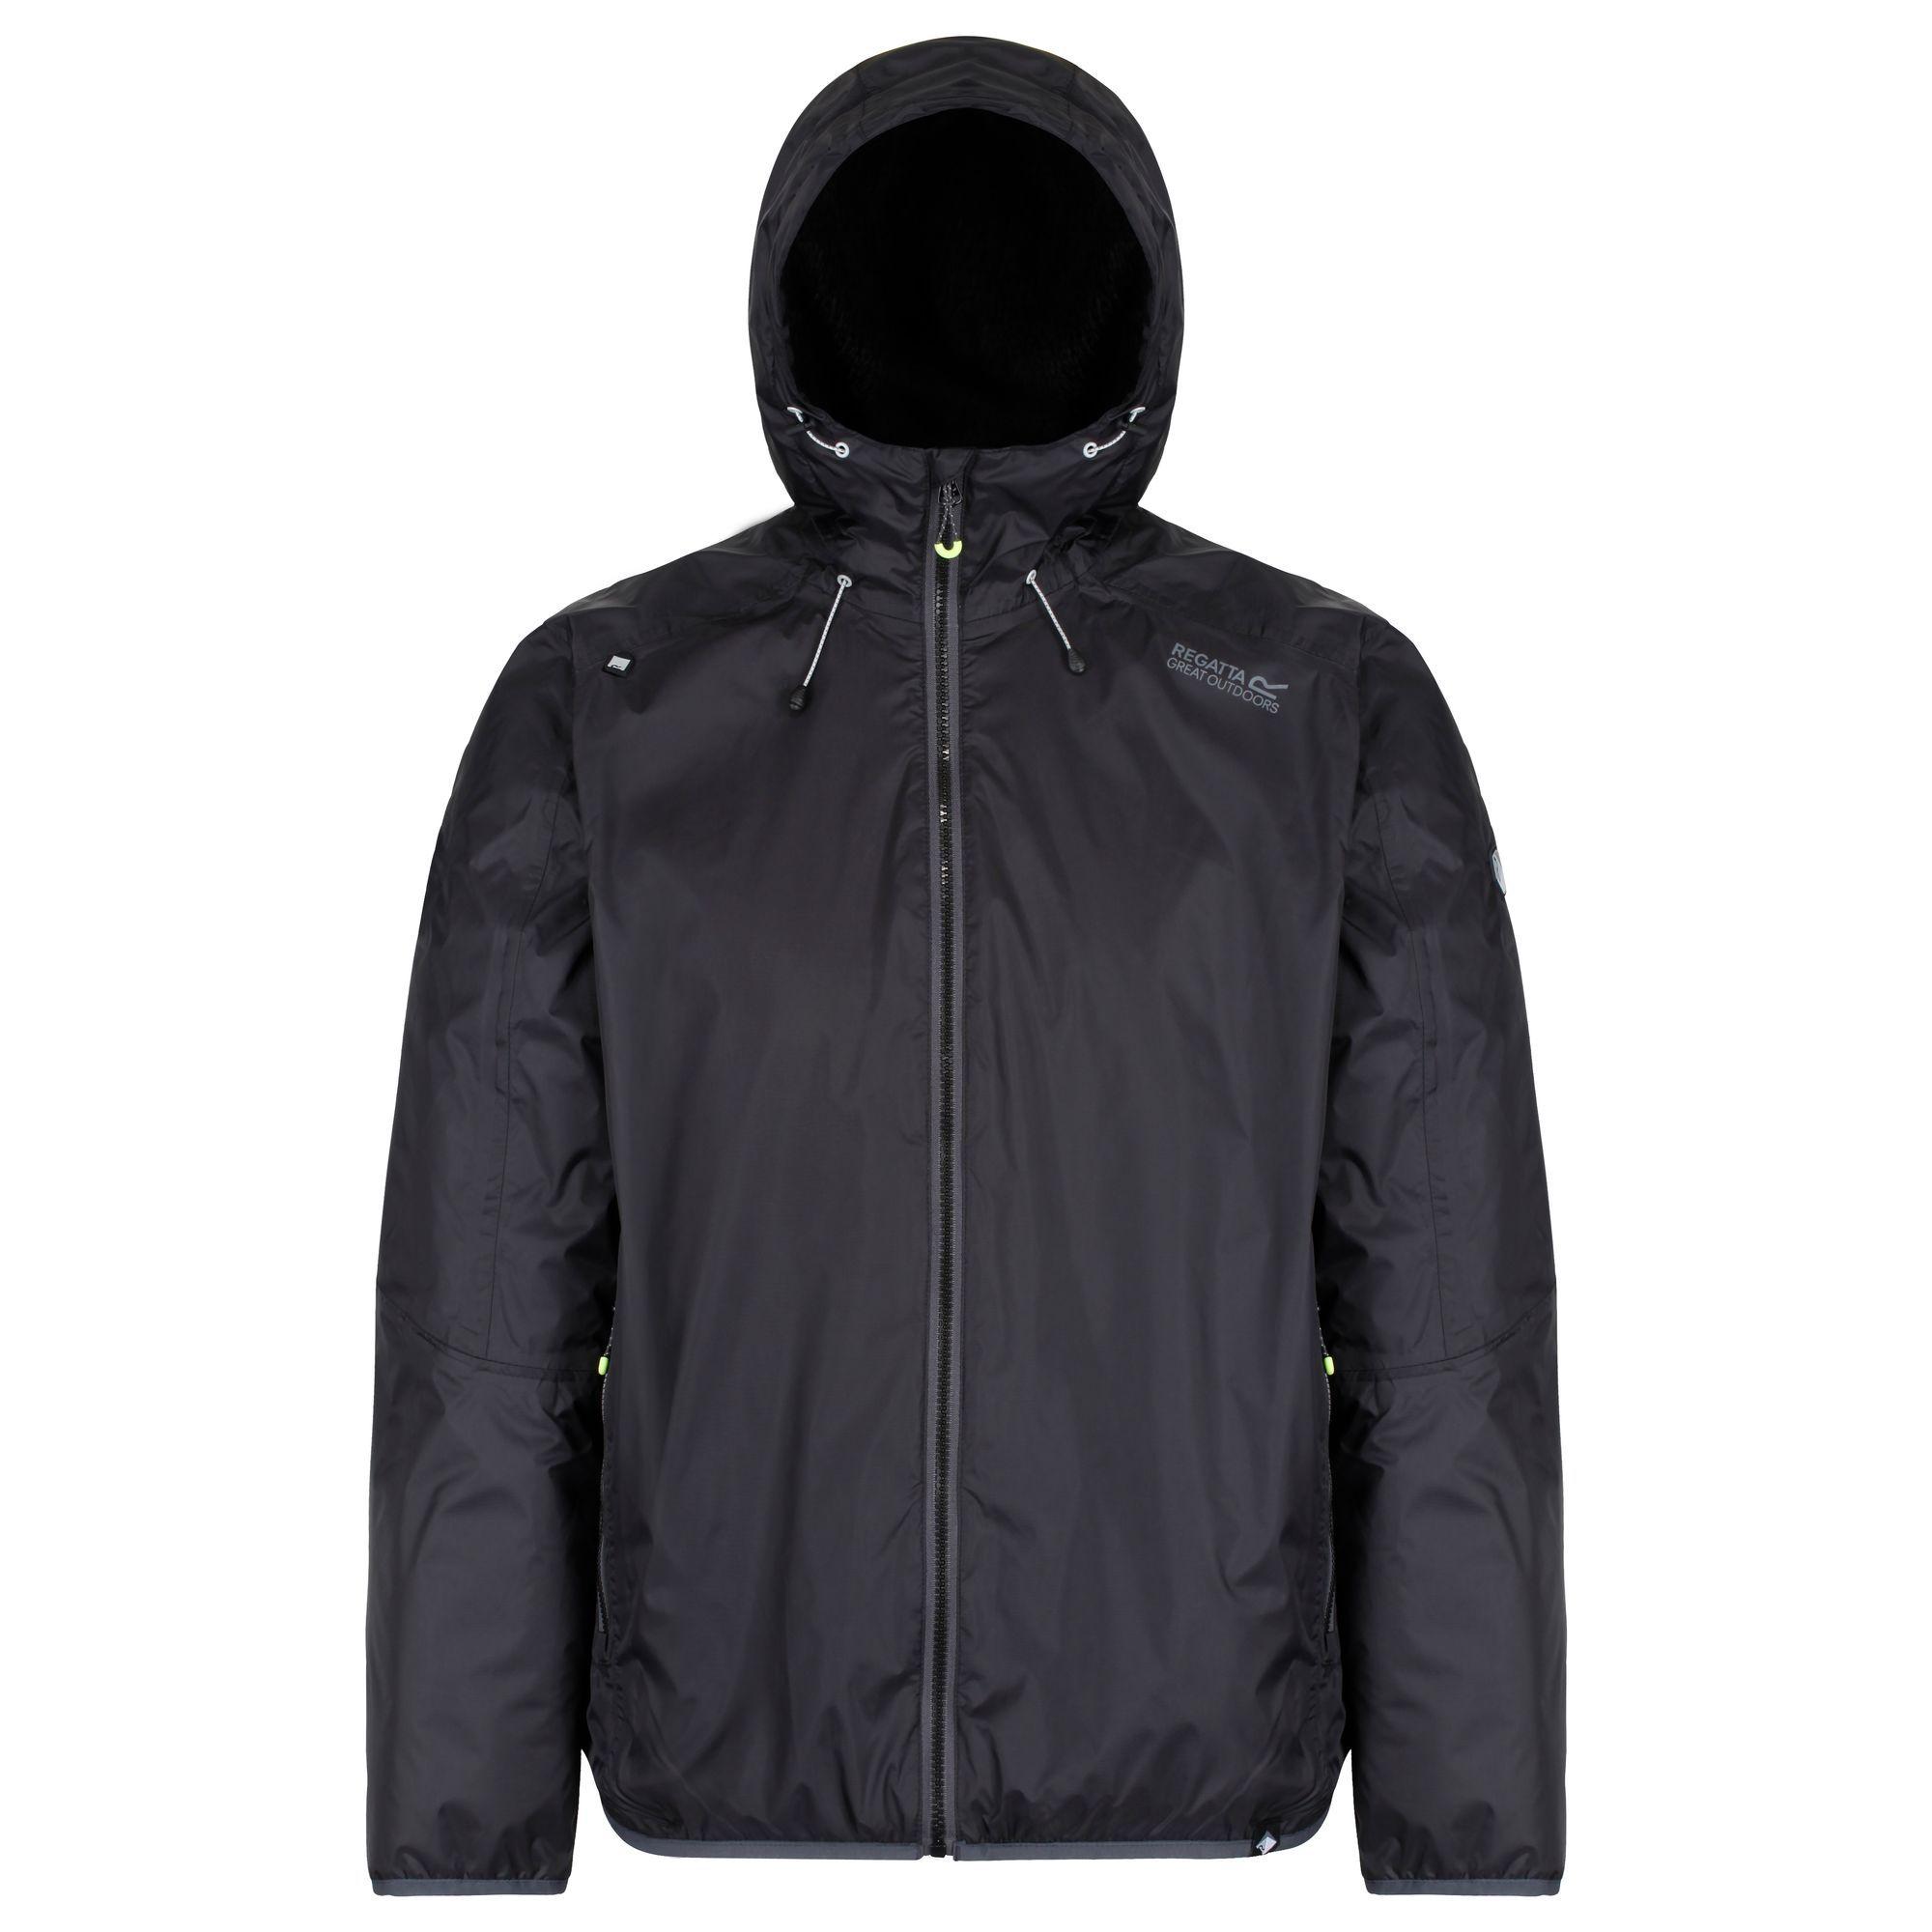 Regatta Tarren Mens Wateproof Breathable Fleece Lined Jacket RRP £70